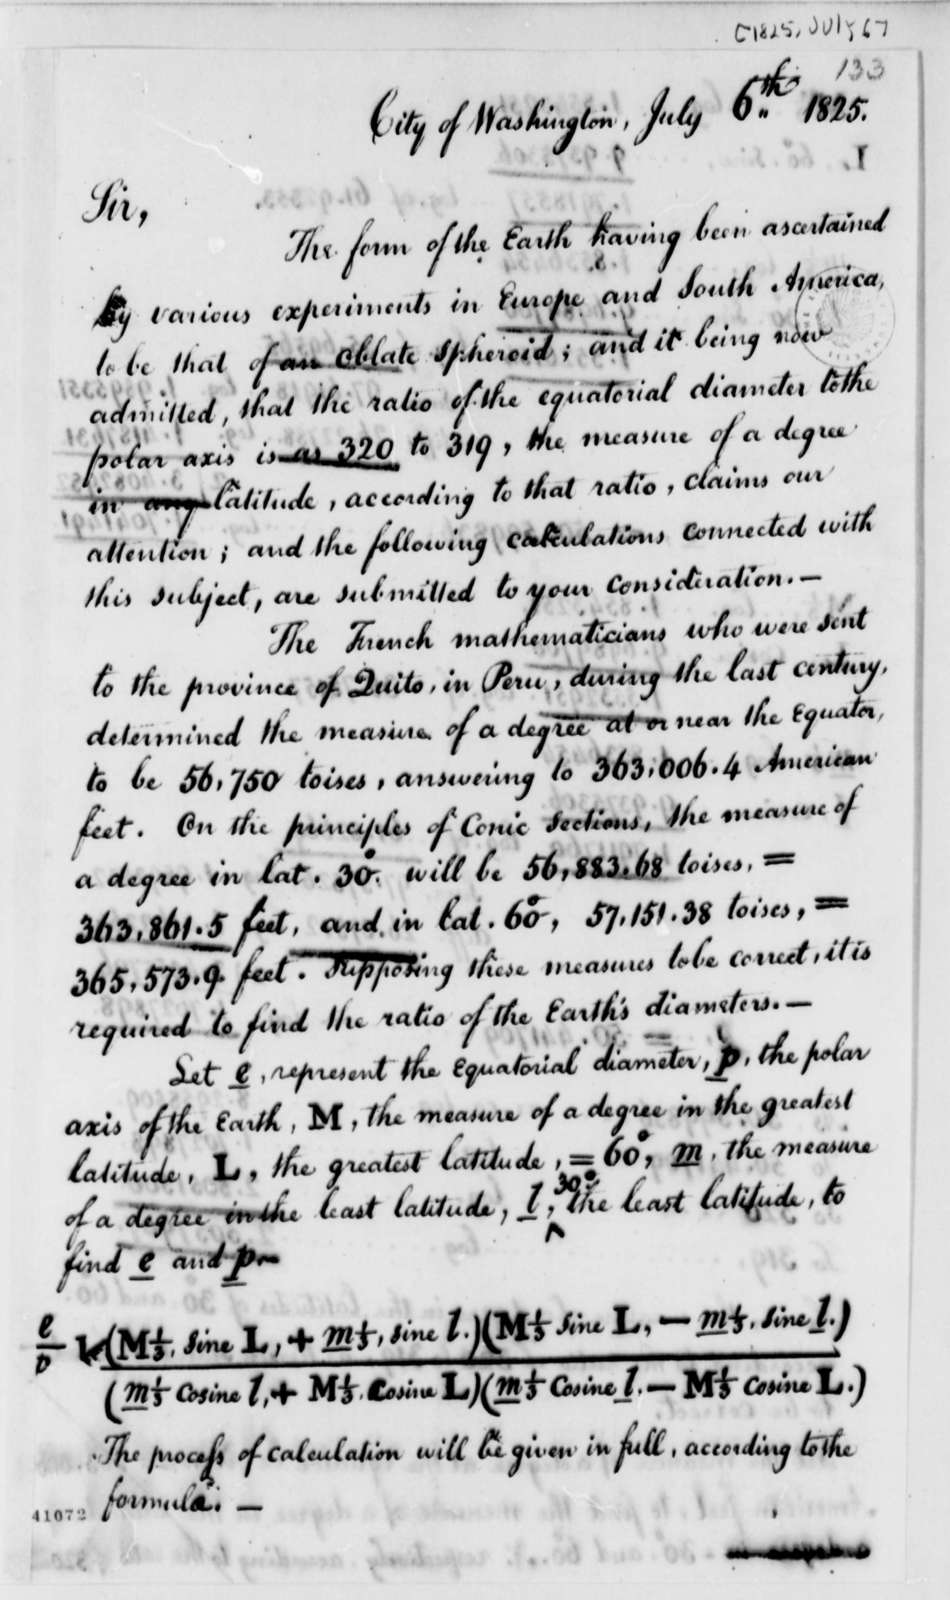 William Lambert to Thomas Jefferson, July 6, 1825